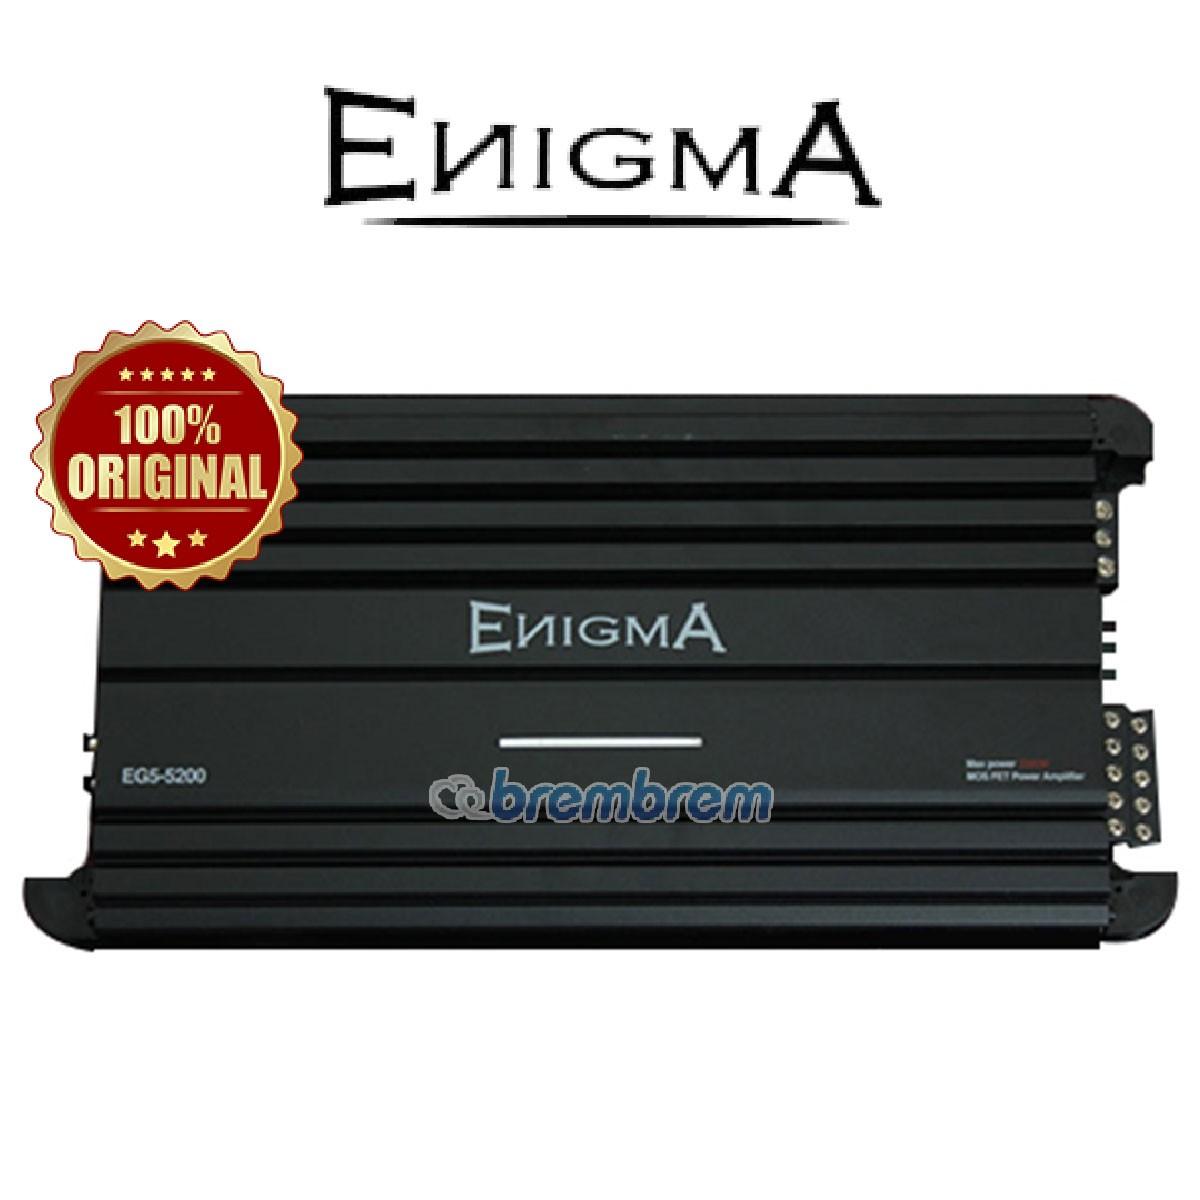 ENIGMA EG5 5200 - POWER 5 CHANNEL